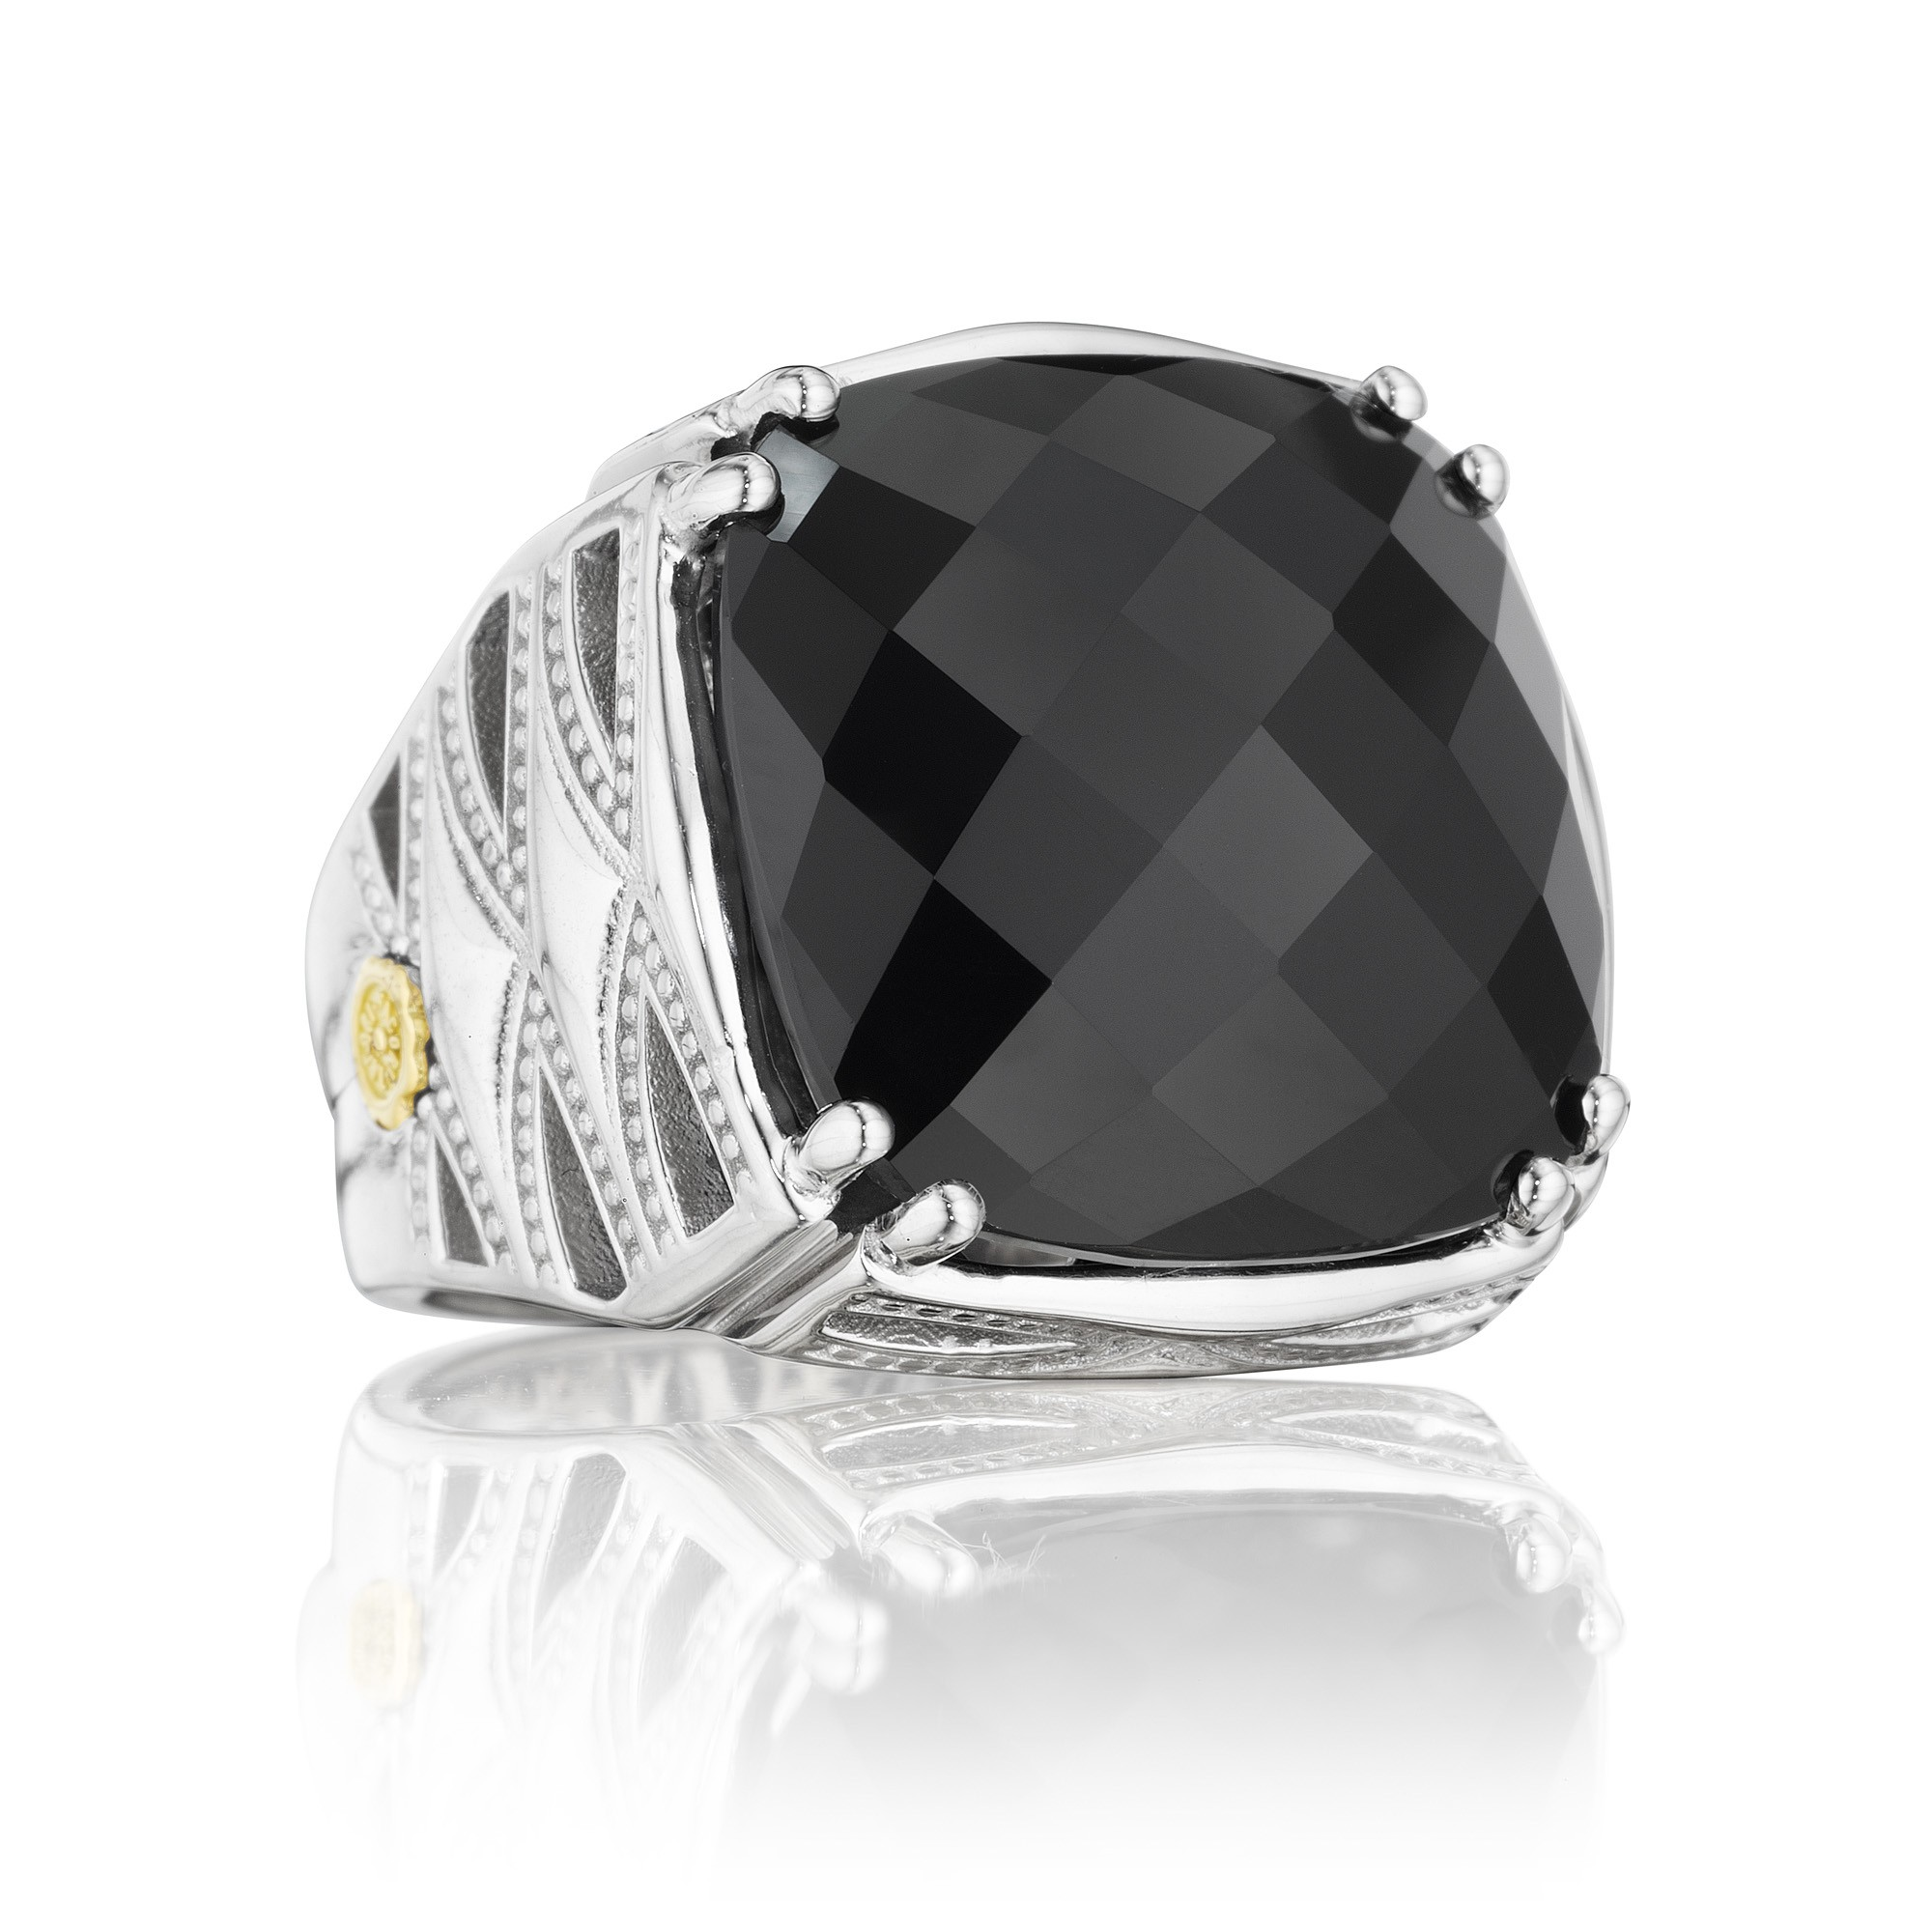 Style# SR13119 - Classic Rock - Rings - Jewelry - Tacori.com